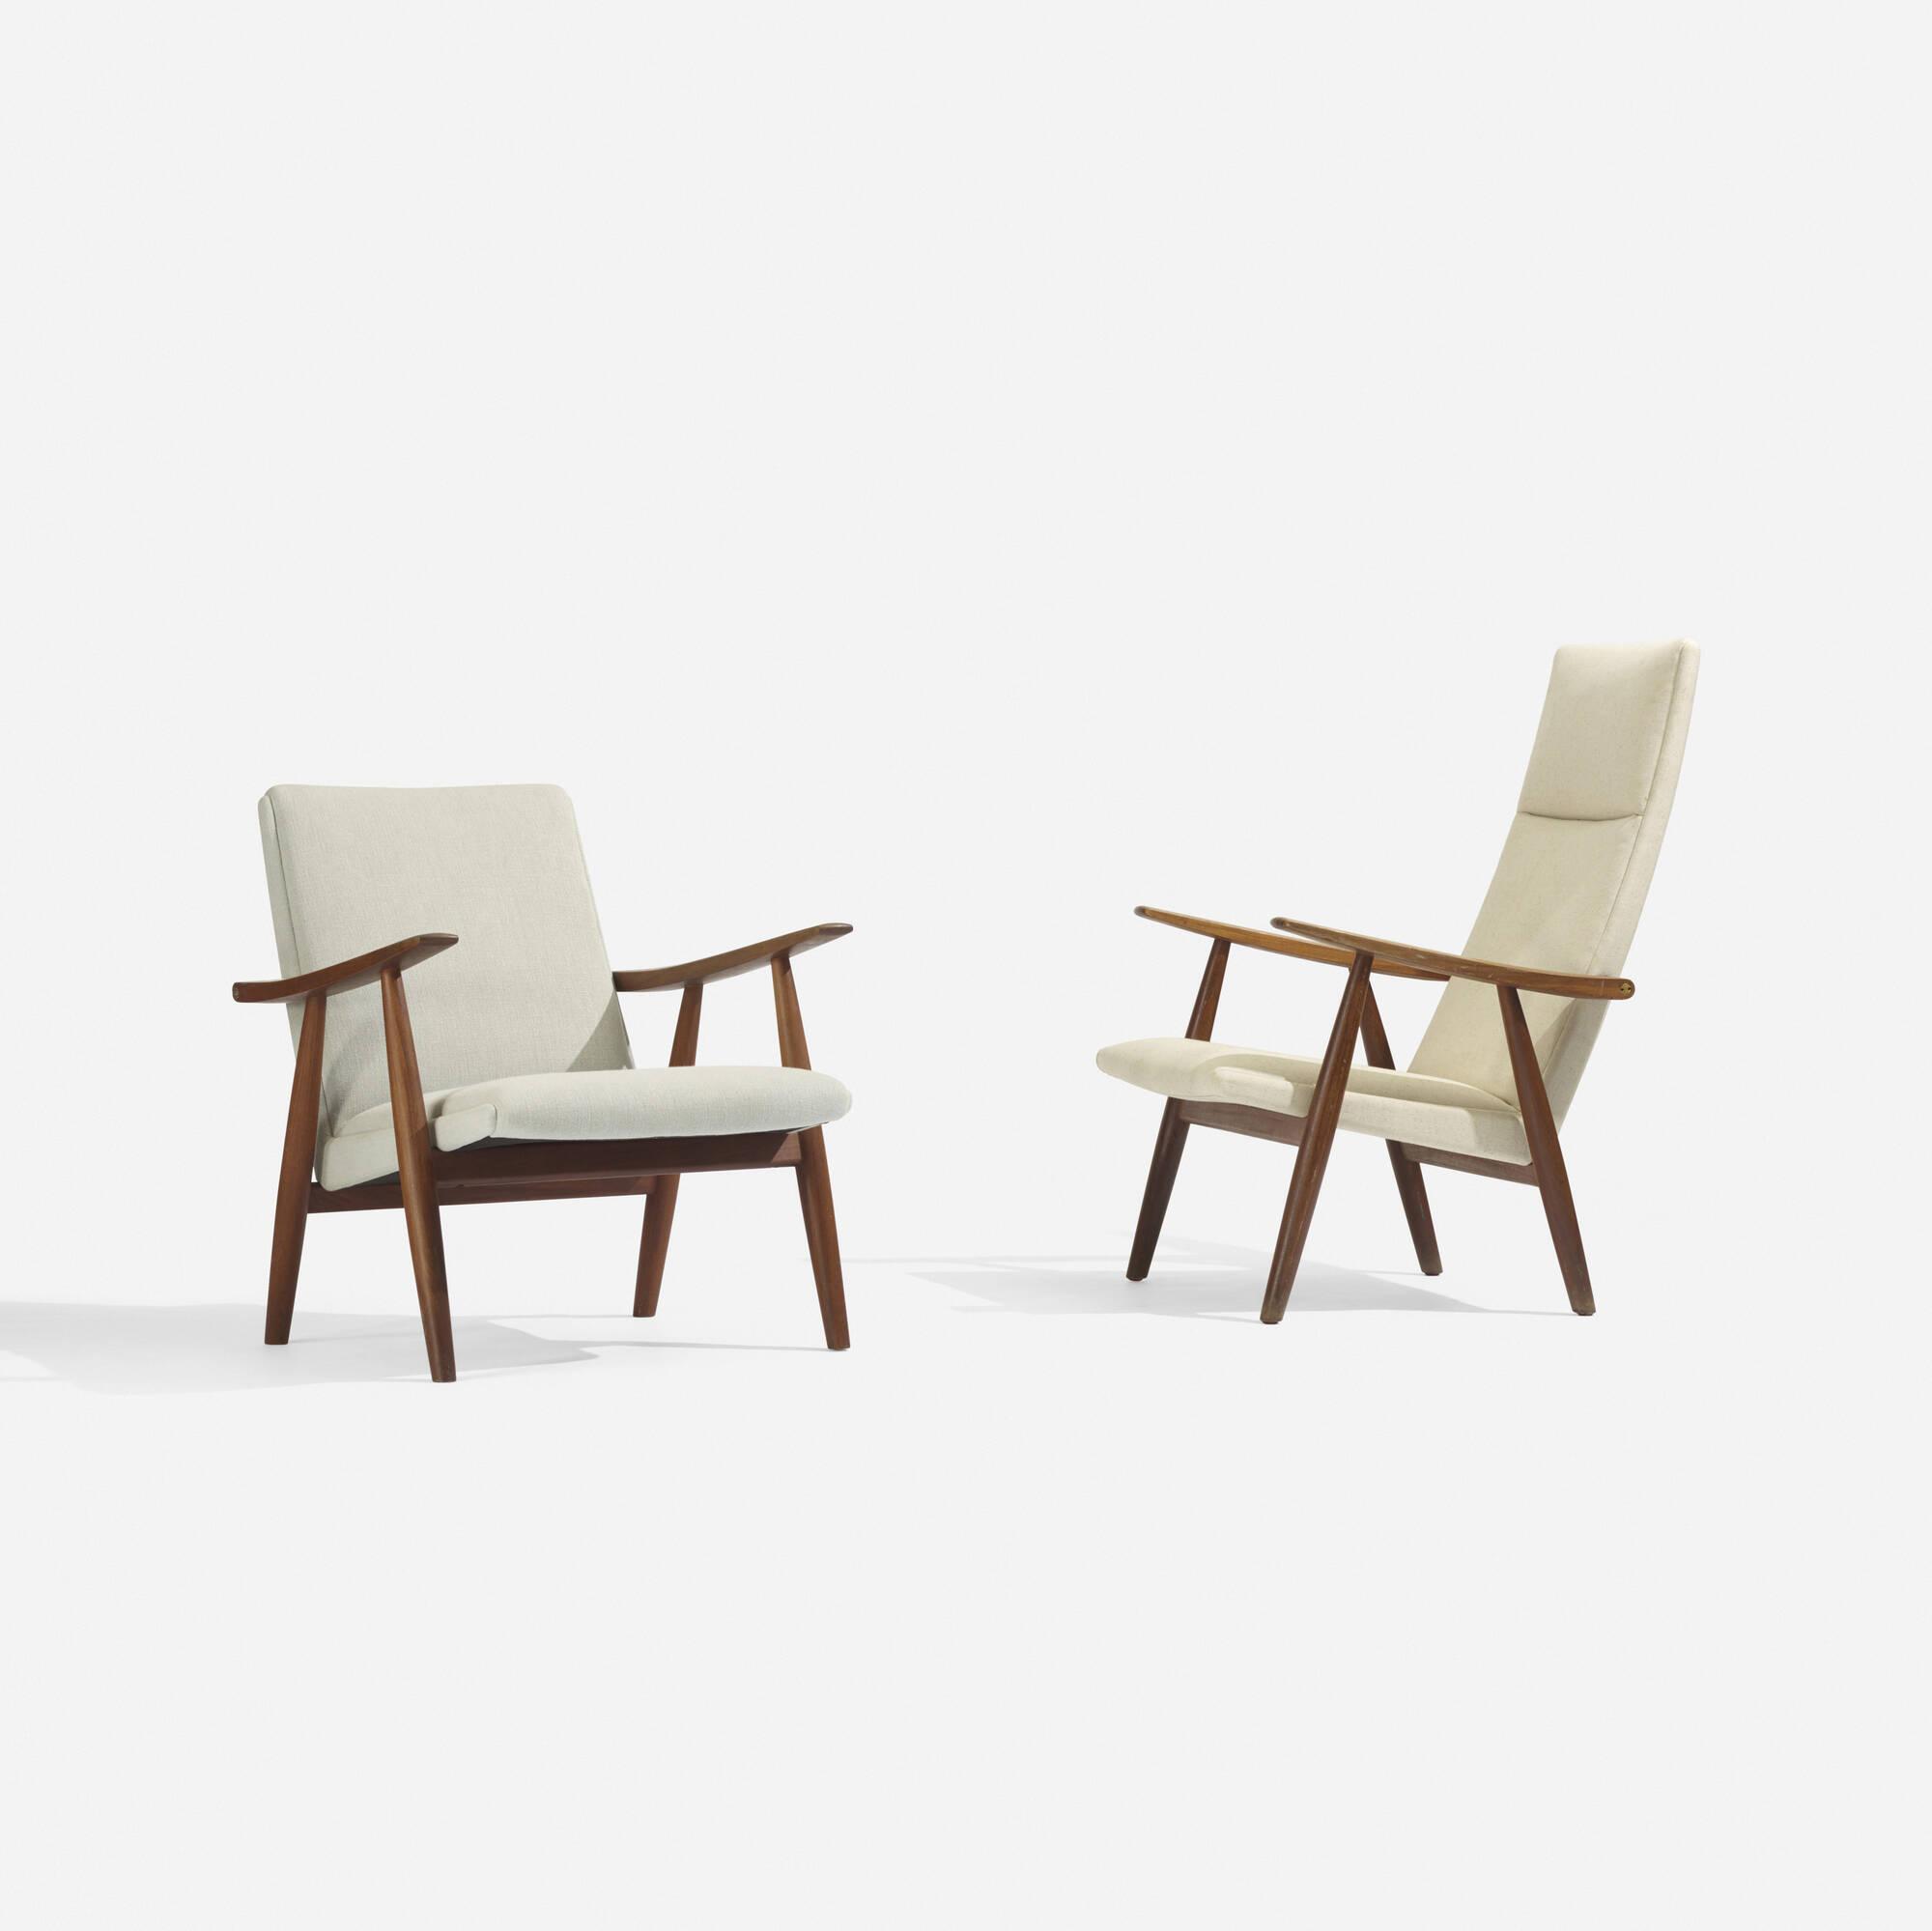 hans j wegner furniture. 264 hans j wegner lounge chair model ge260 and furniture